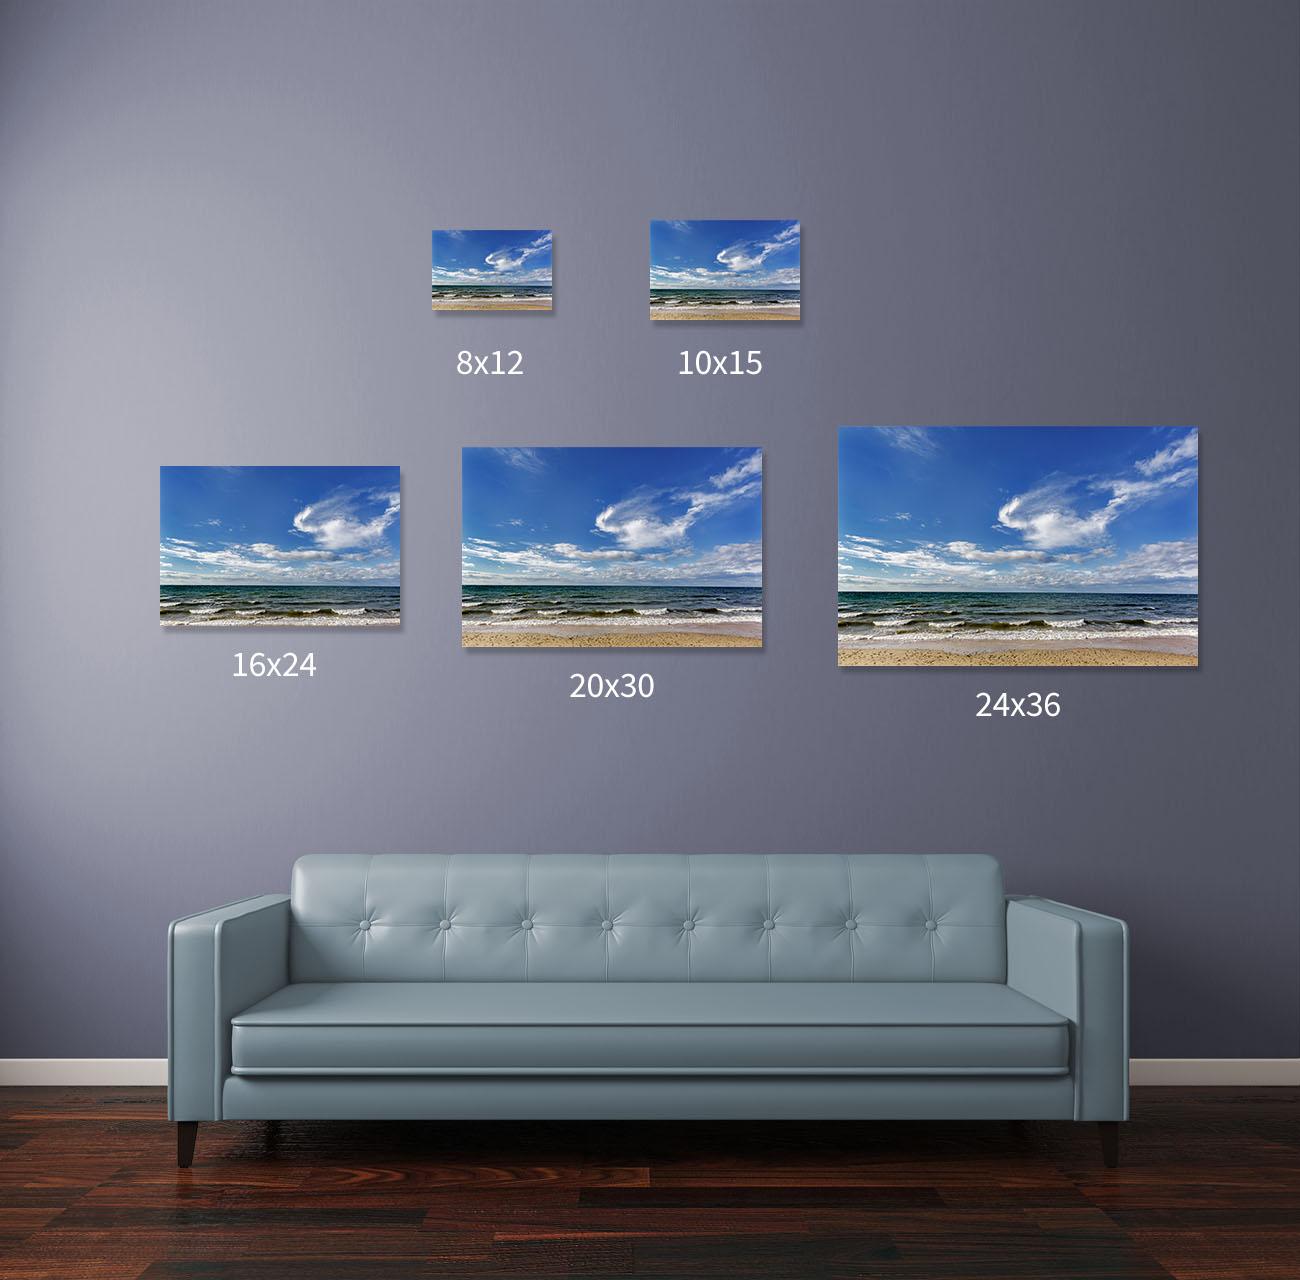 Hufnagel fine art photography print size options